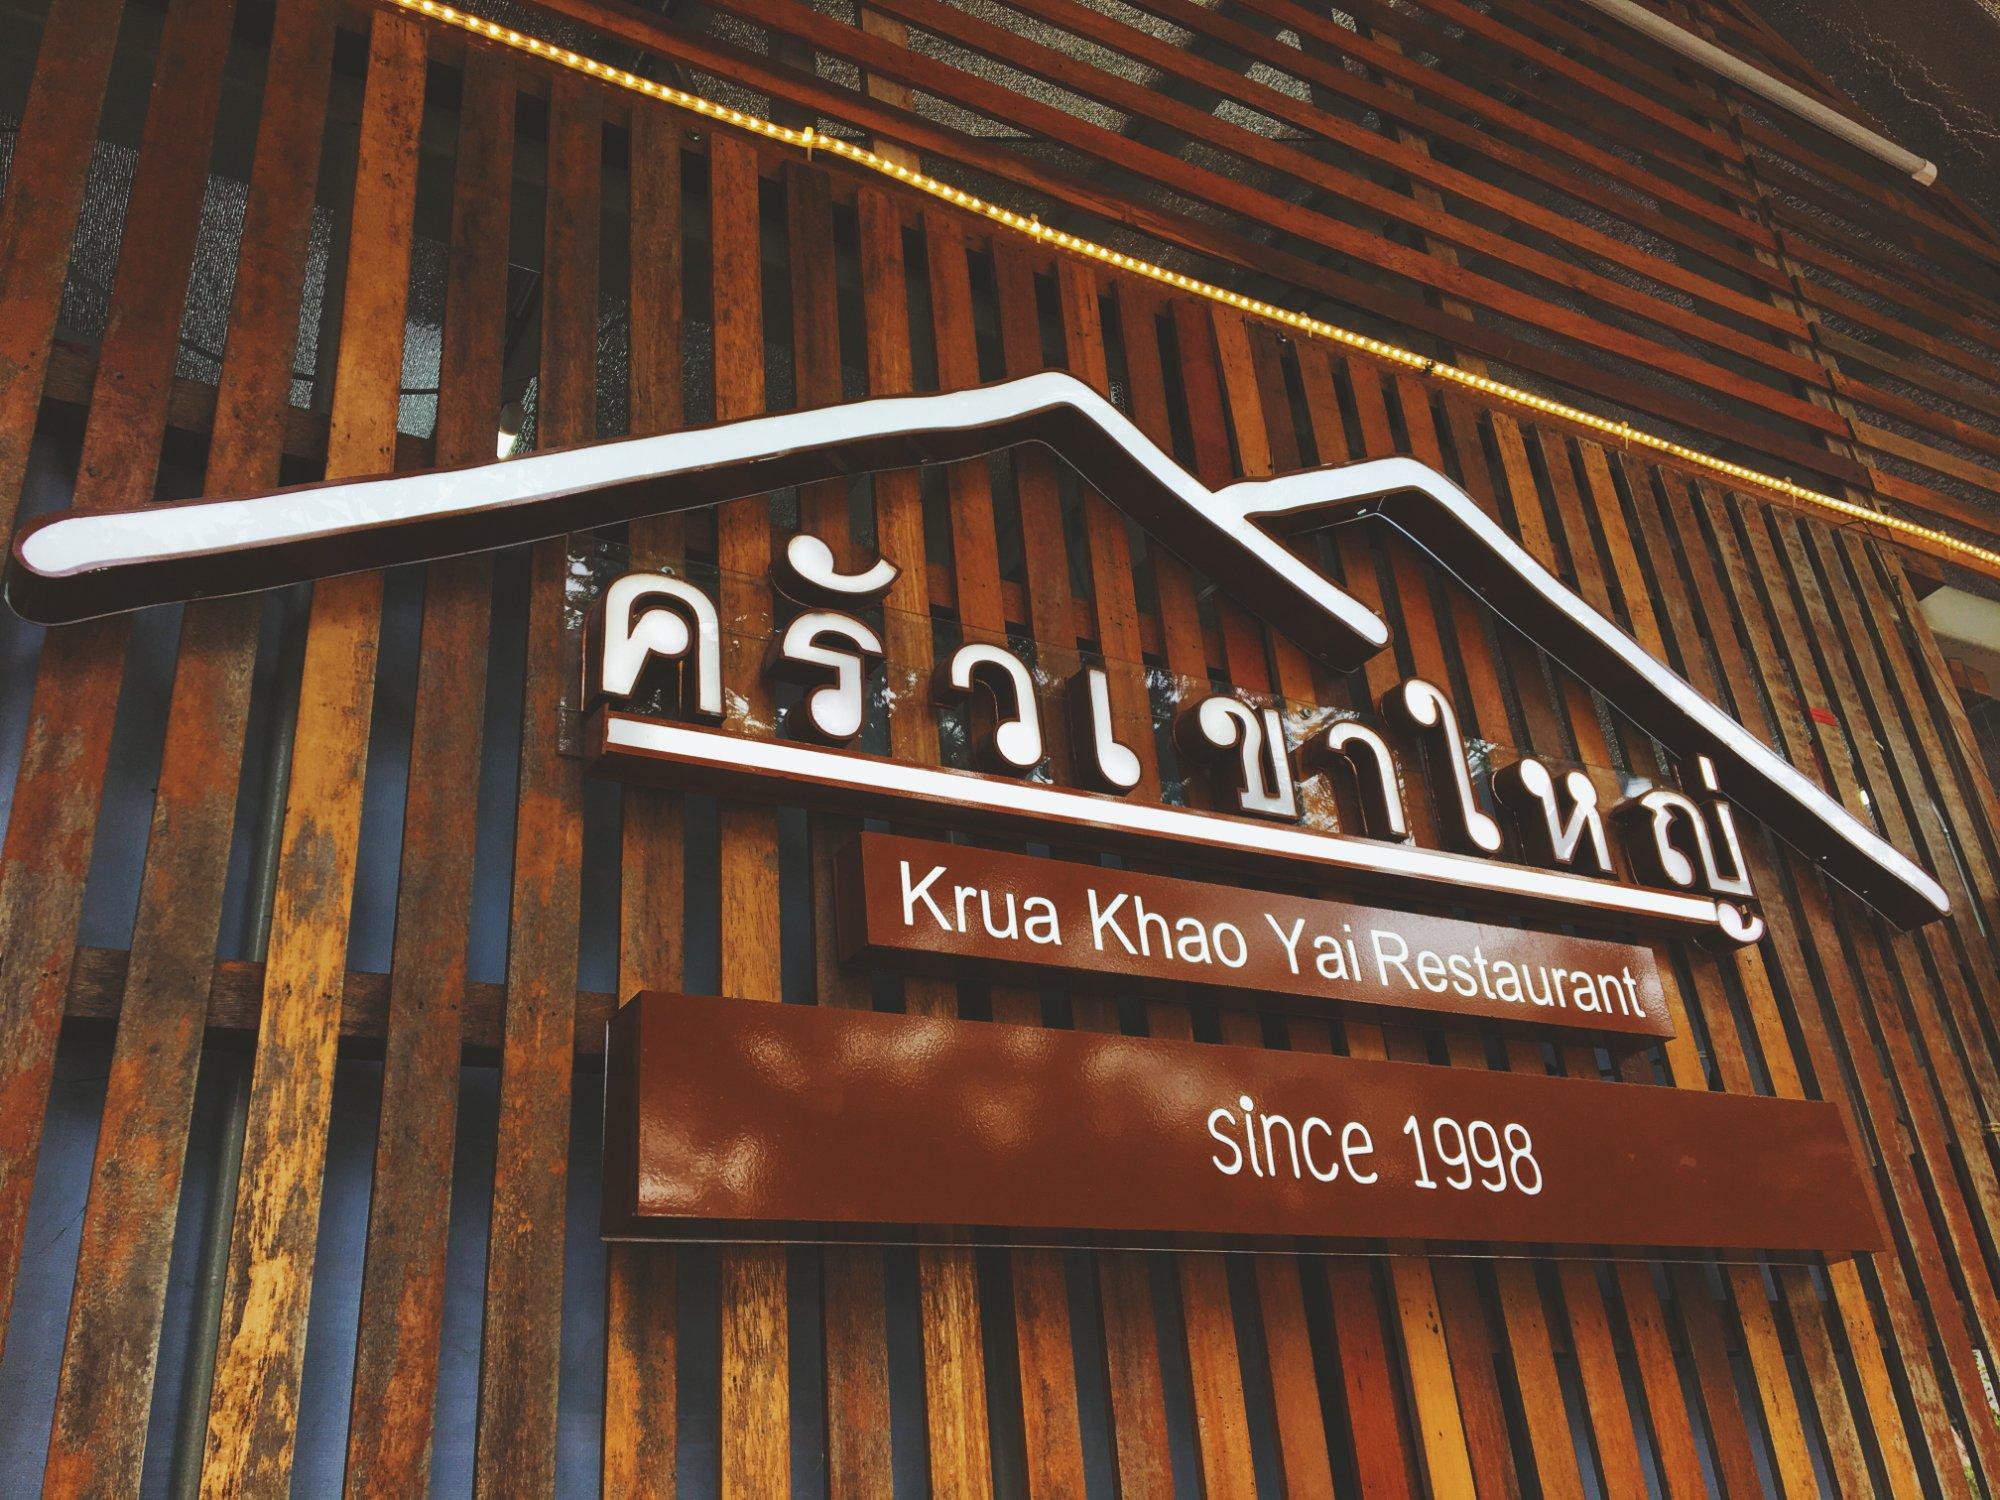 Krua Khao Yai